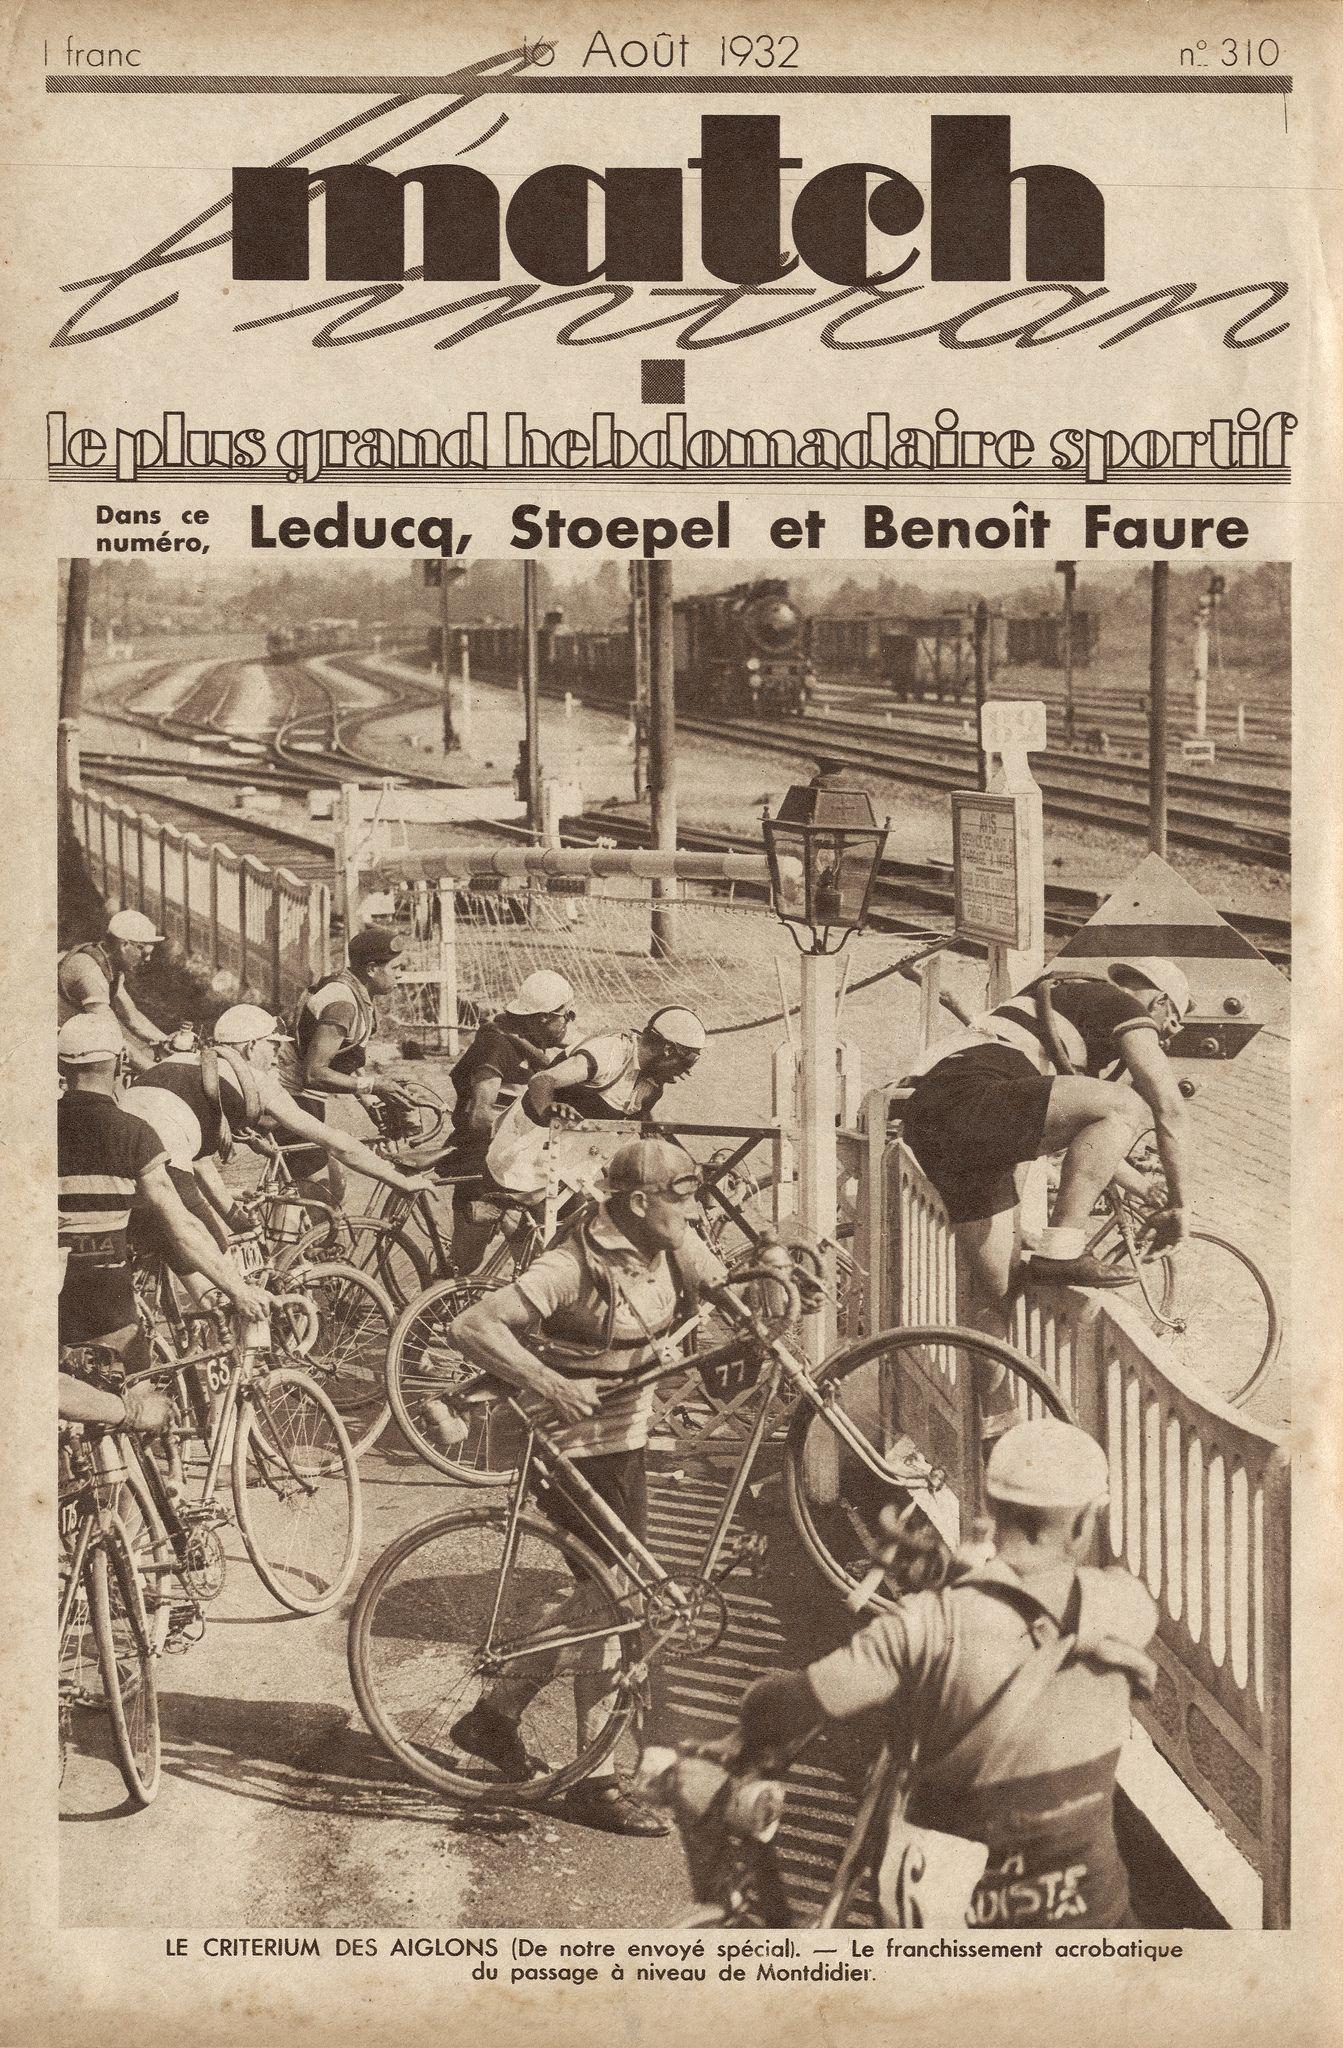 1932, agosto. Critérium des Aiglons. Passaggio a livello a Montdidier [Match L'Intran]